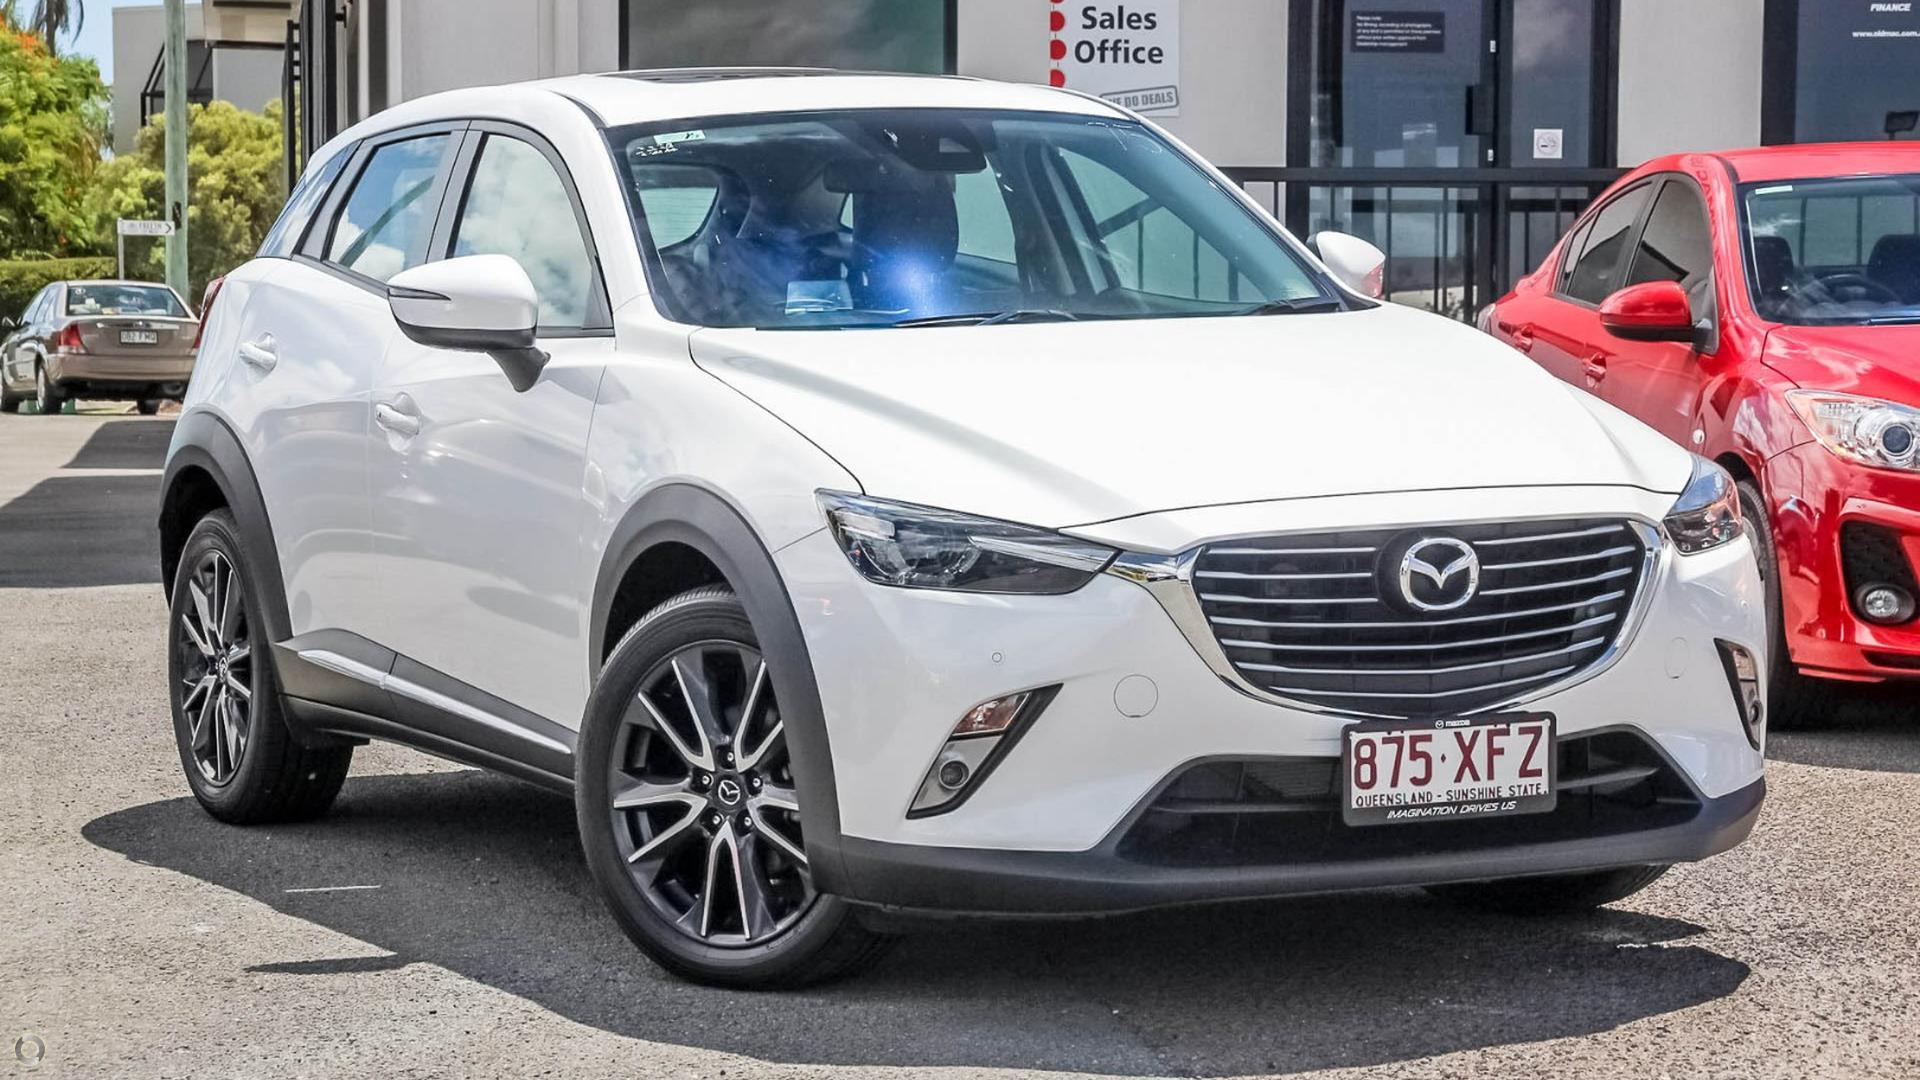 2017 Mazda Cx-3 Akari